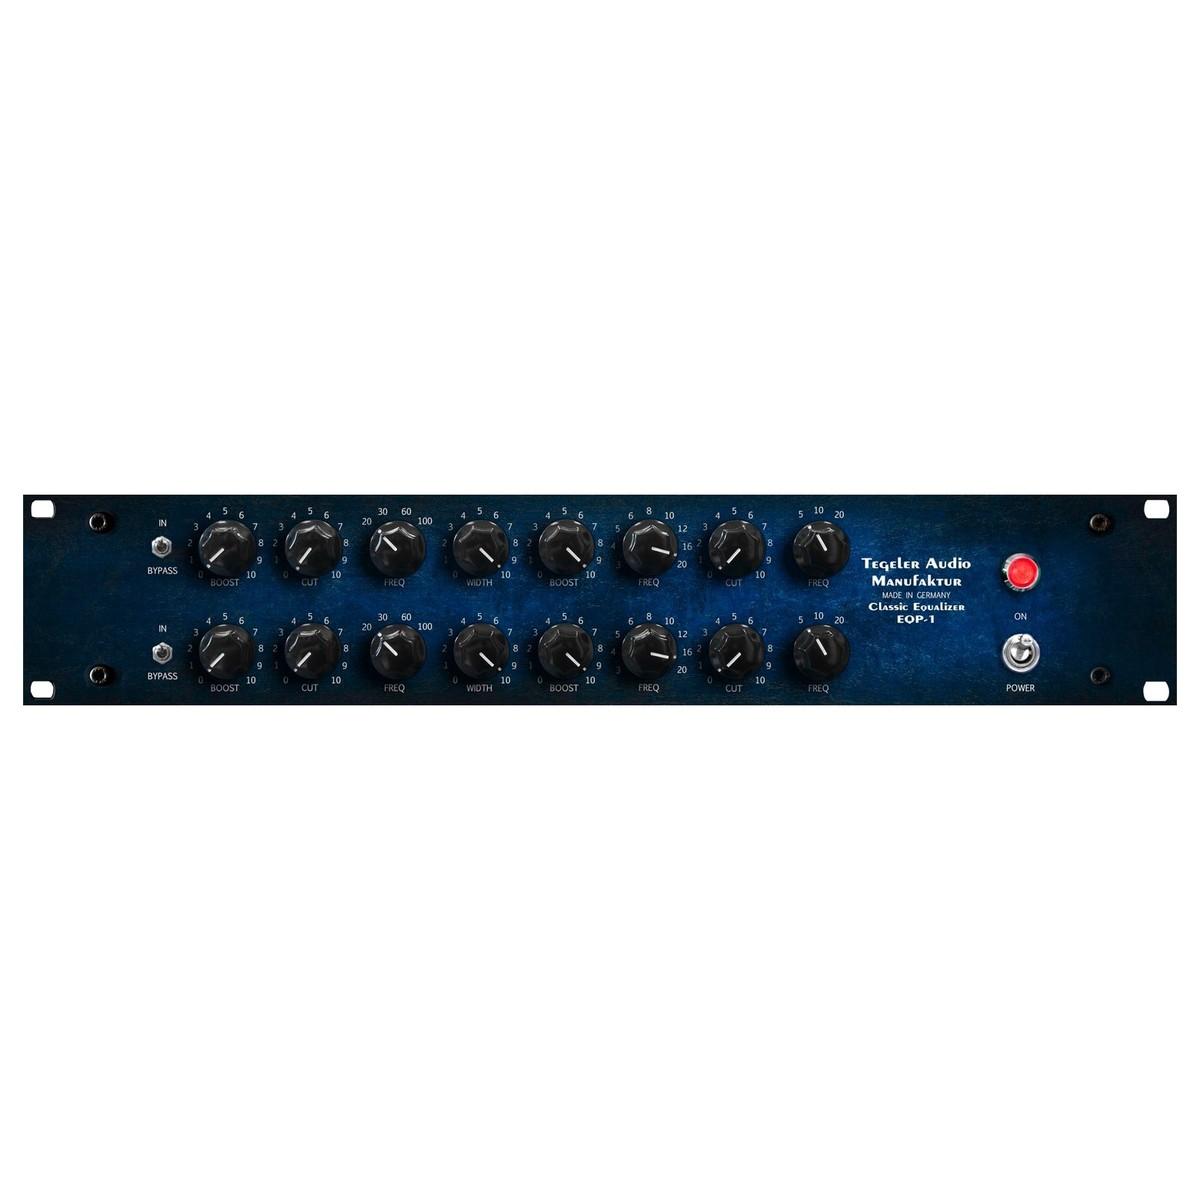 Tegeler Audio Equalizer classique EQP1 Tube à Gear4Music com